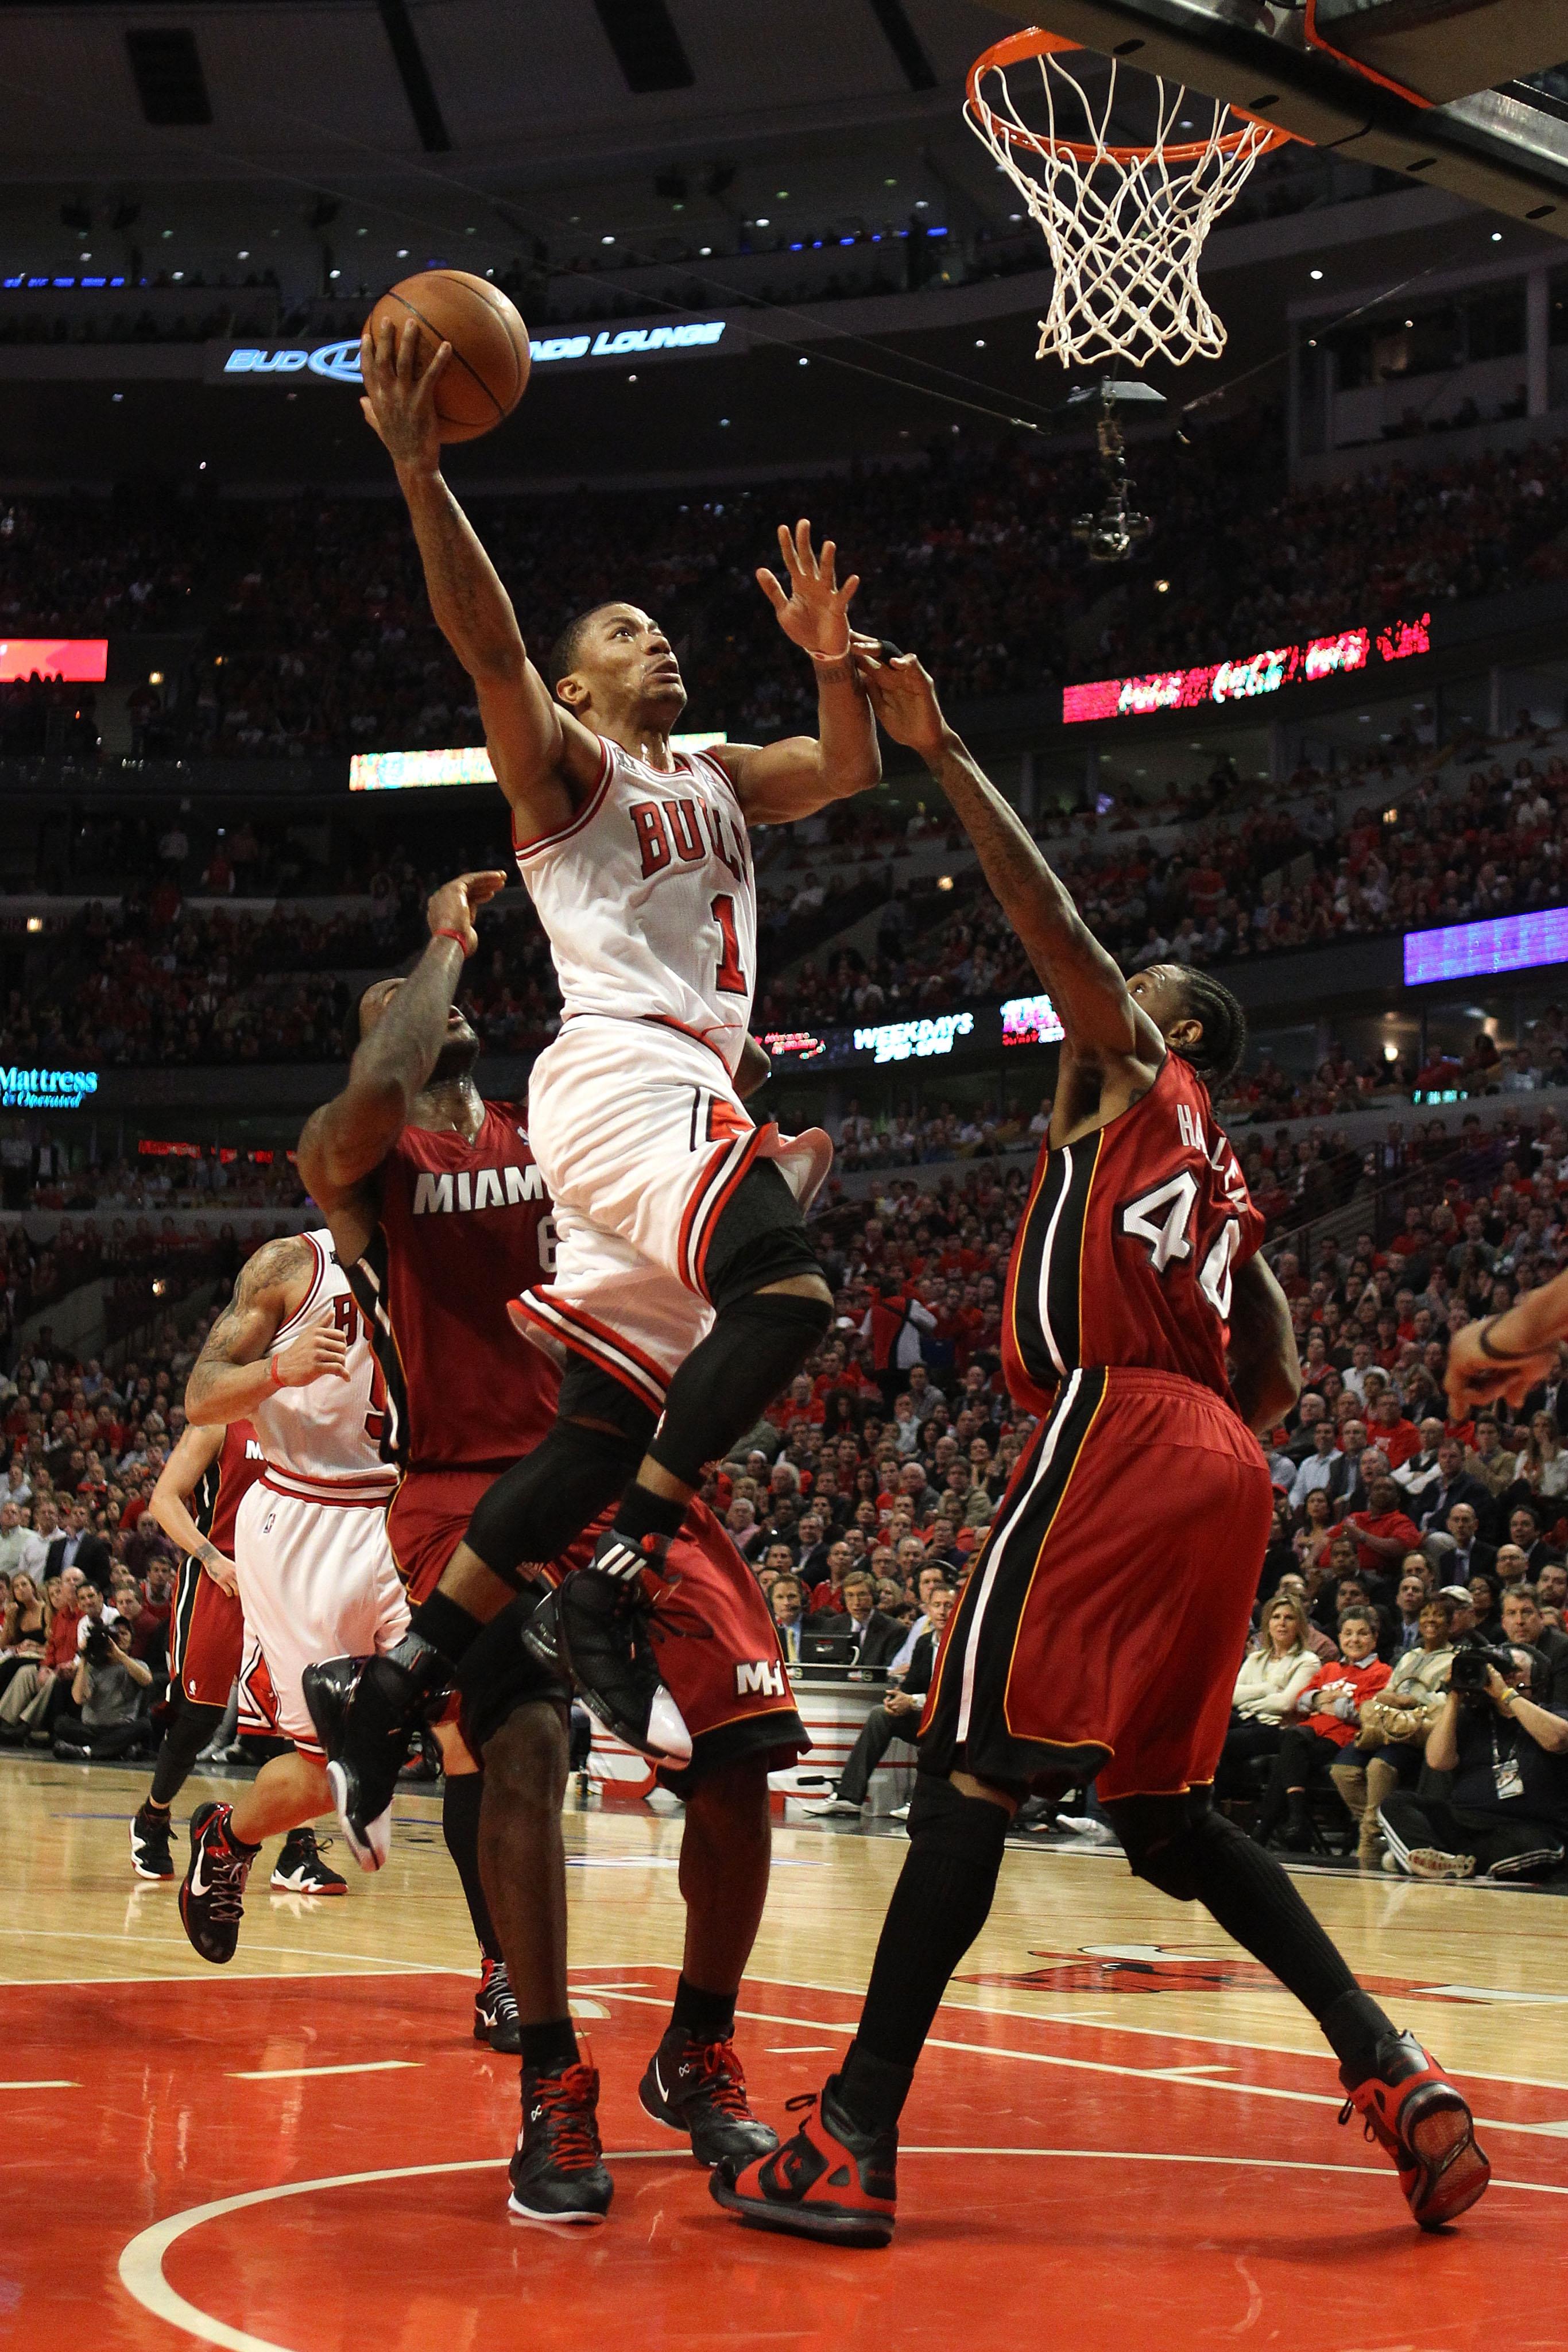 Bulls vs. Heat - Game Summary - May 24, 2011 - ESPN